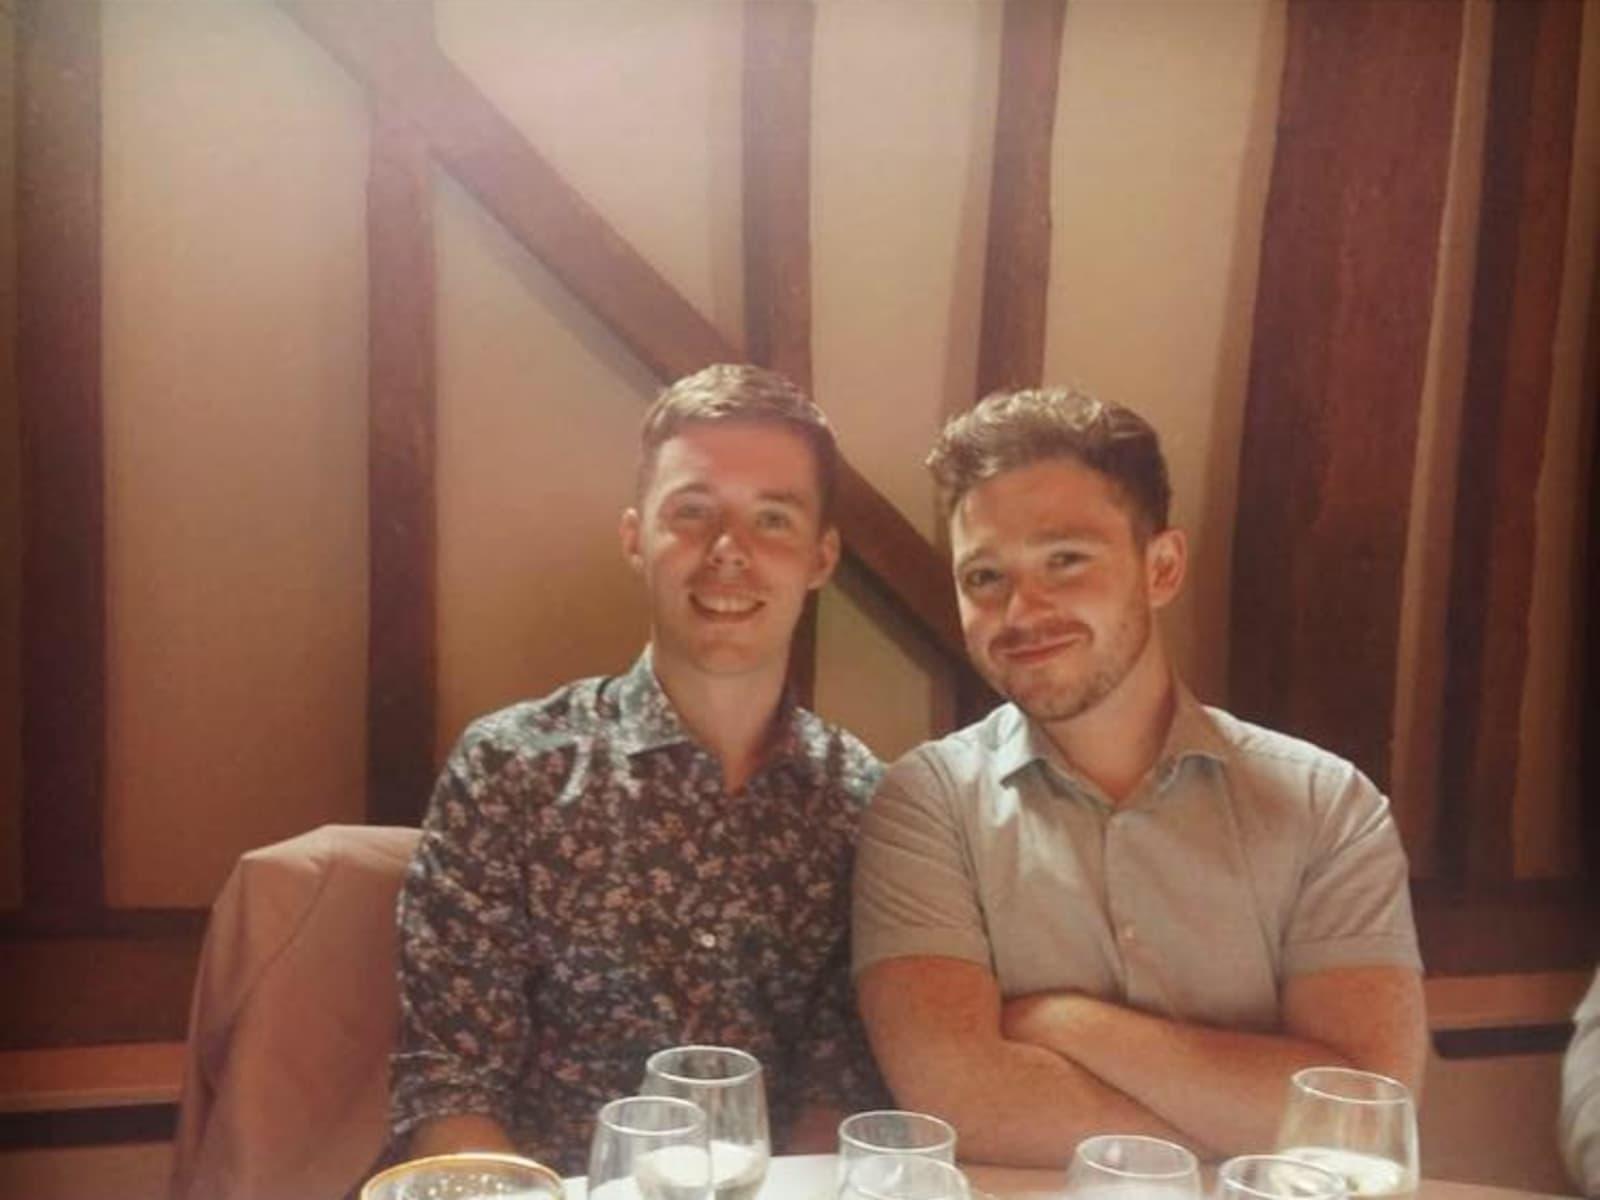 Ciaran & Jacob from Sydney, New South Wales, Australia